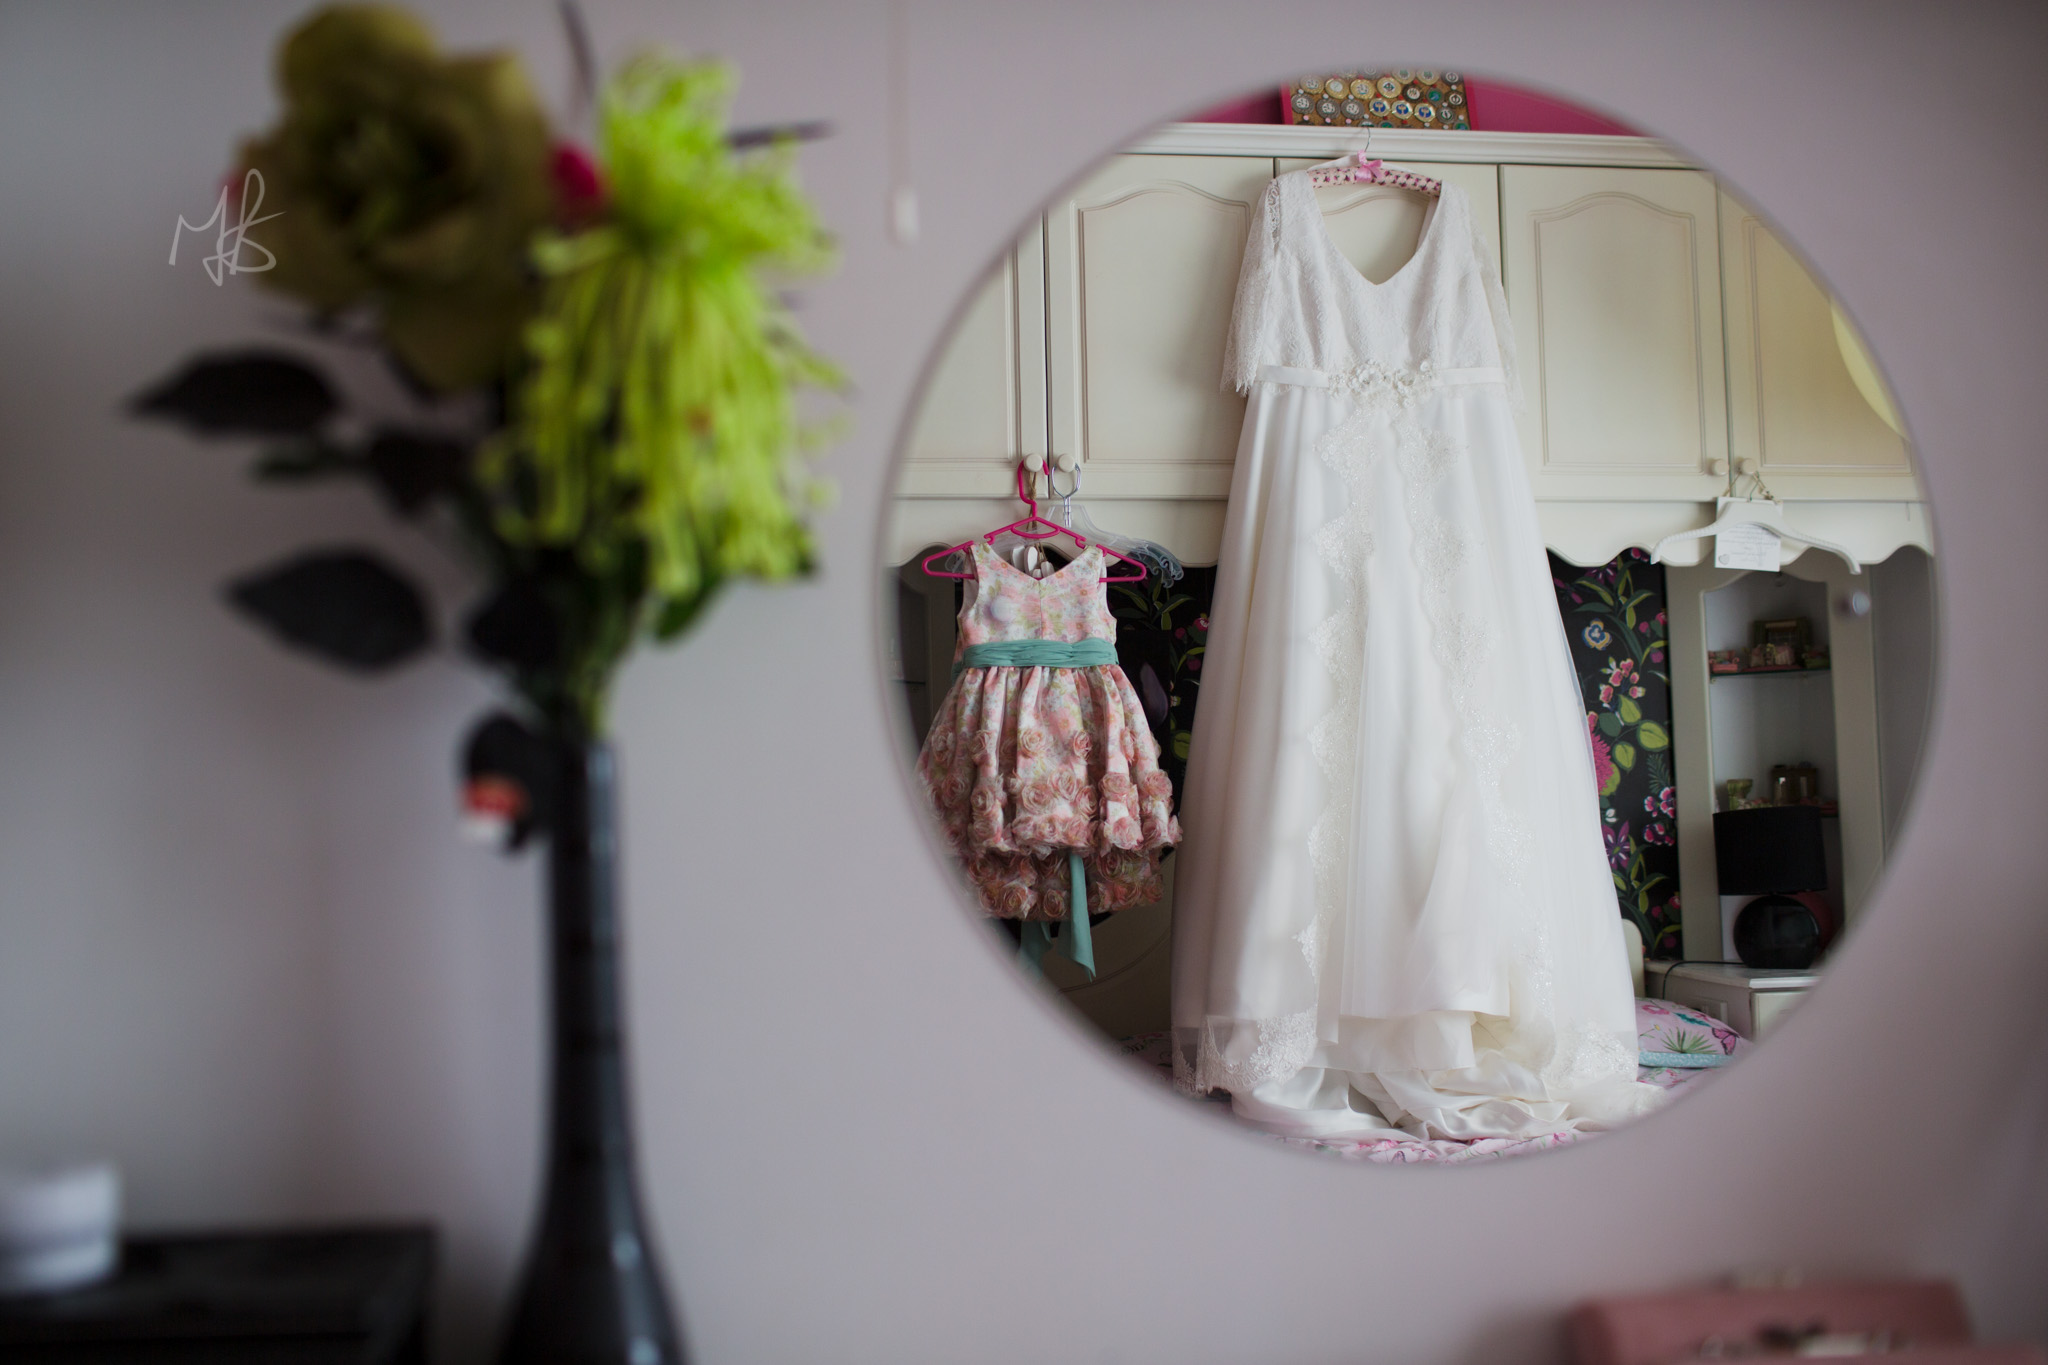 Northern-Ireland-Wedding-Photographer-Mark-Barnes-Ballymena_wedding-photography-Leighinmohr-House-Seamas_Alanna_For-web-4.jpg